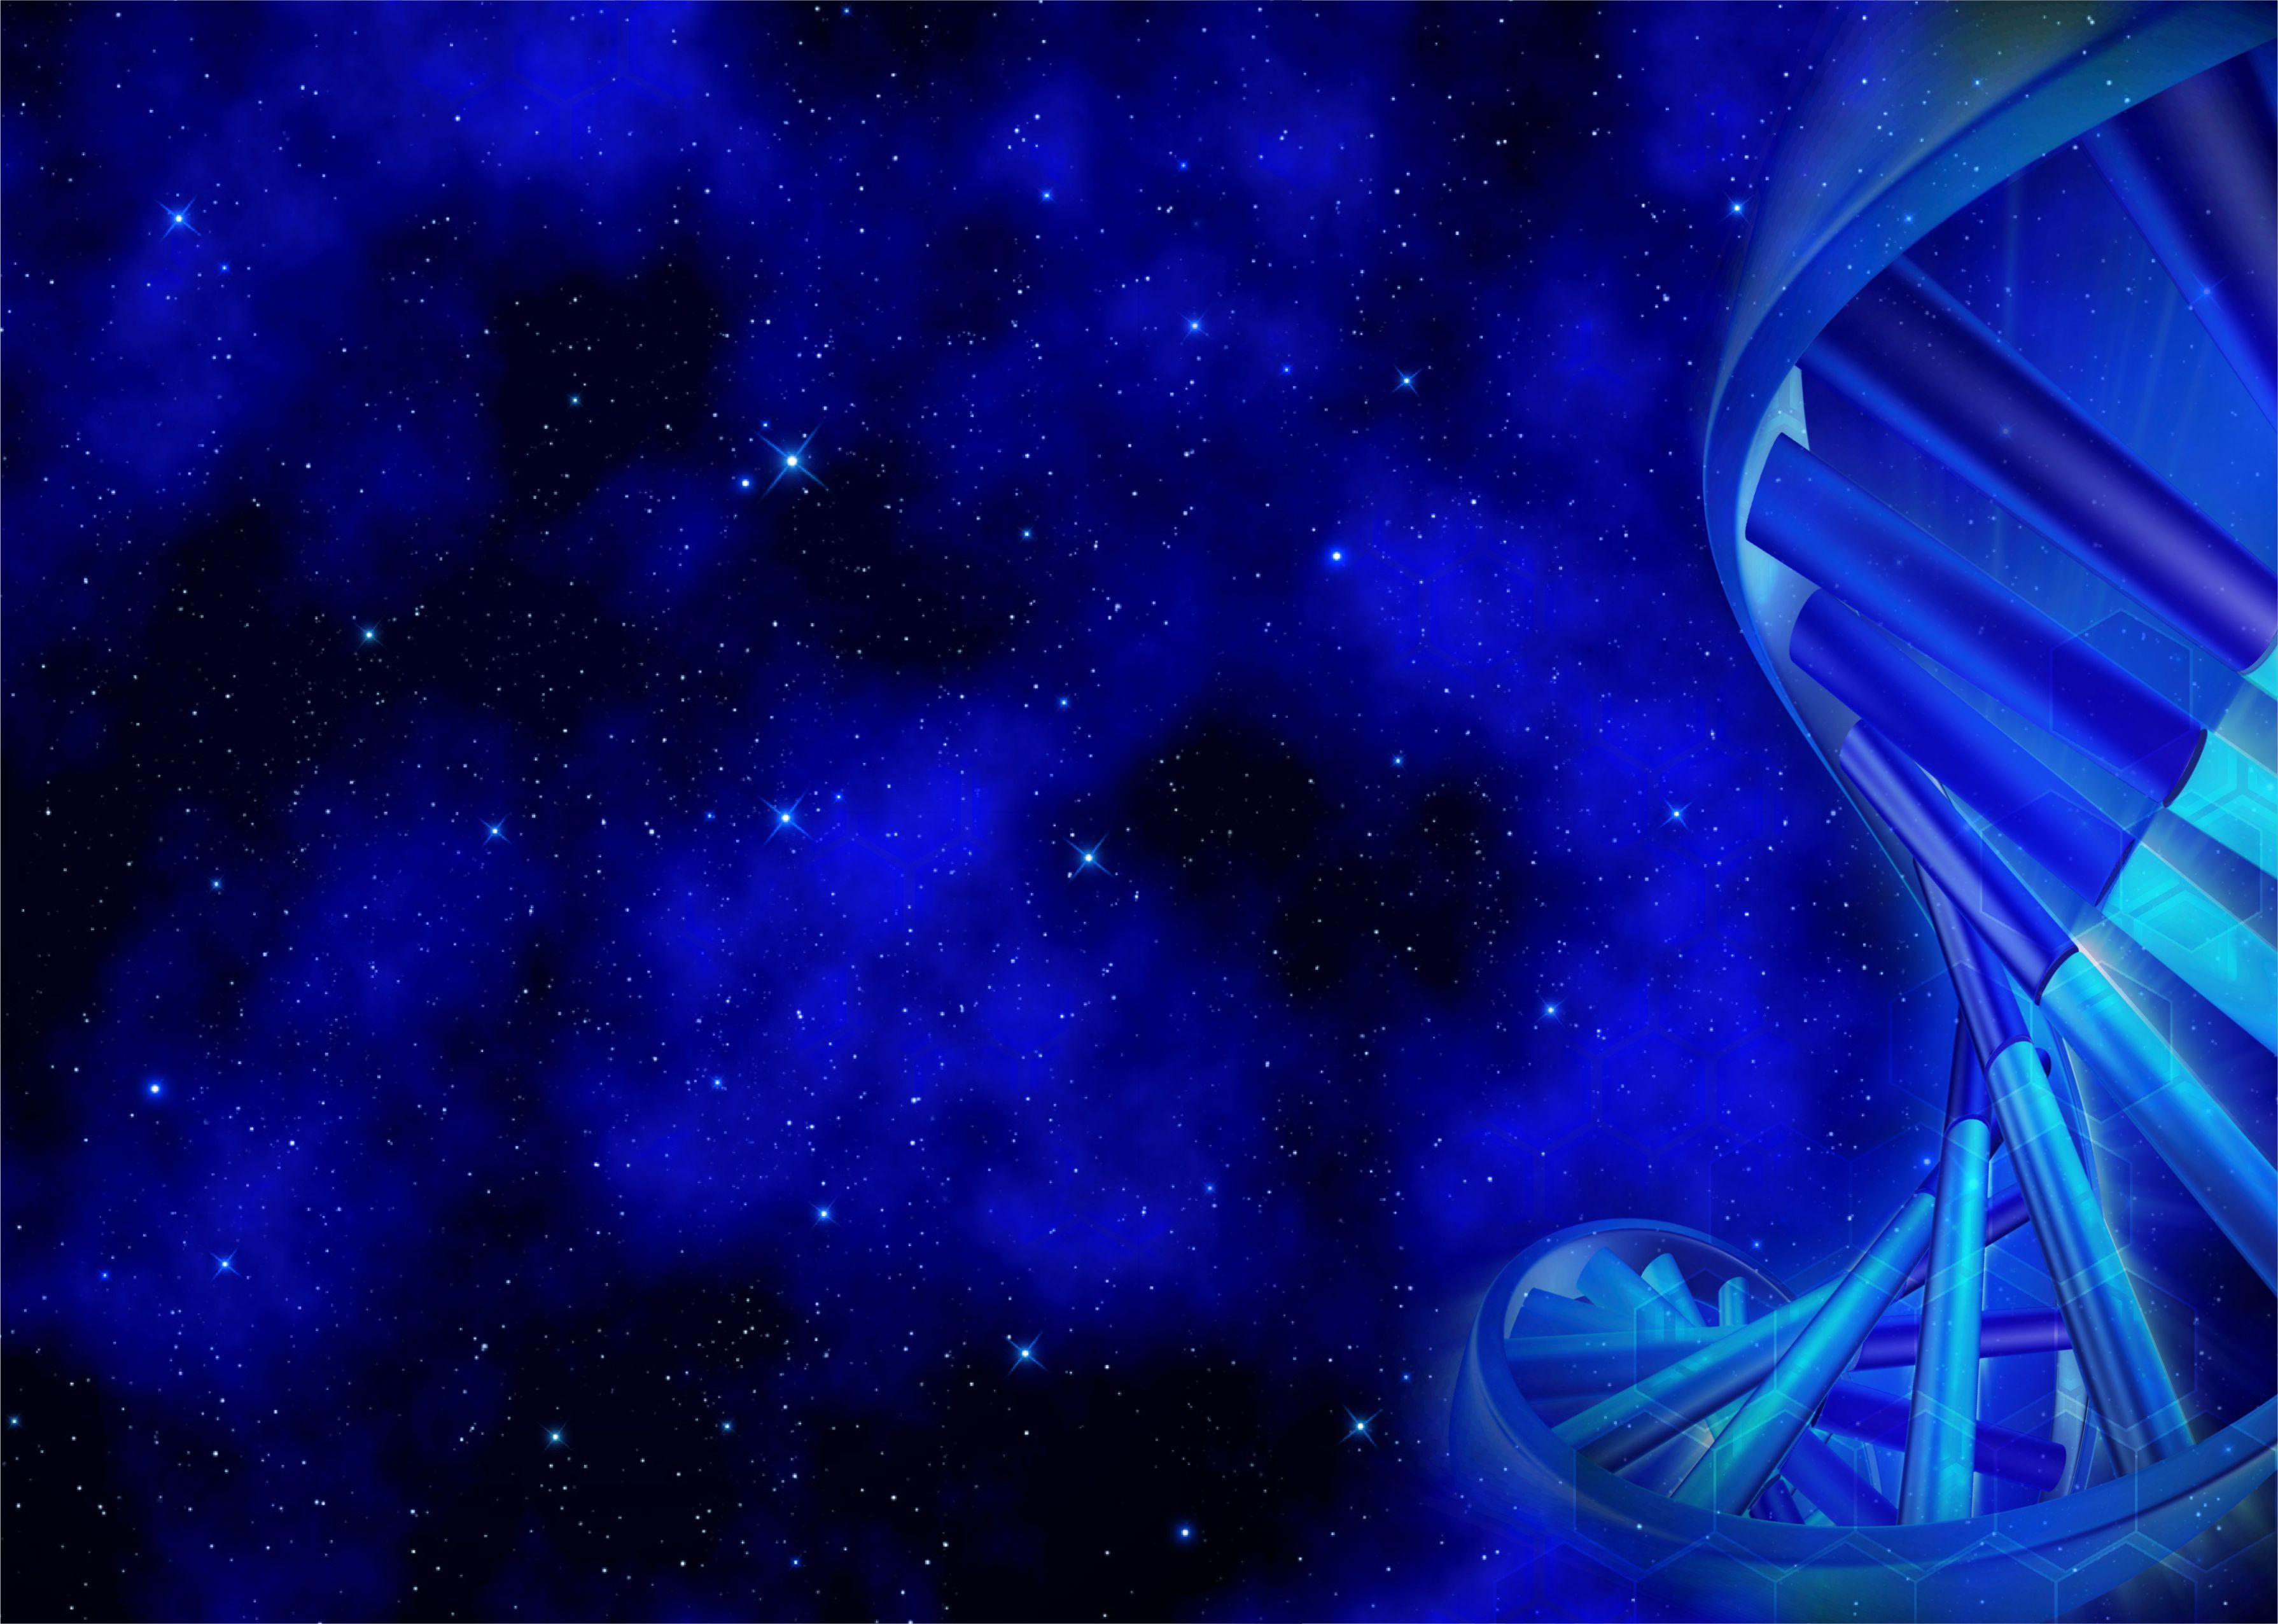 DNA-Cloud-Star-Background-15.01.2016